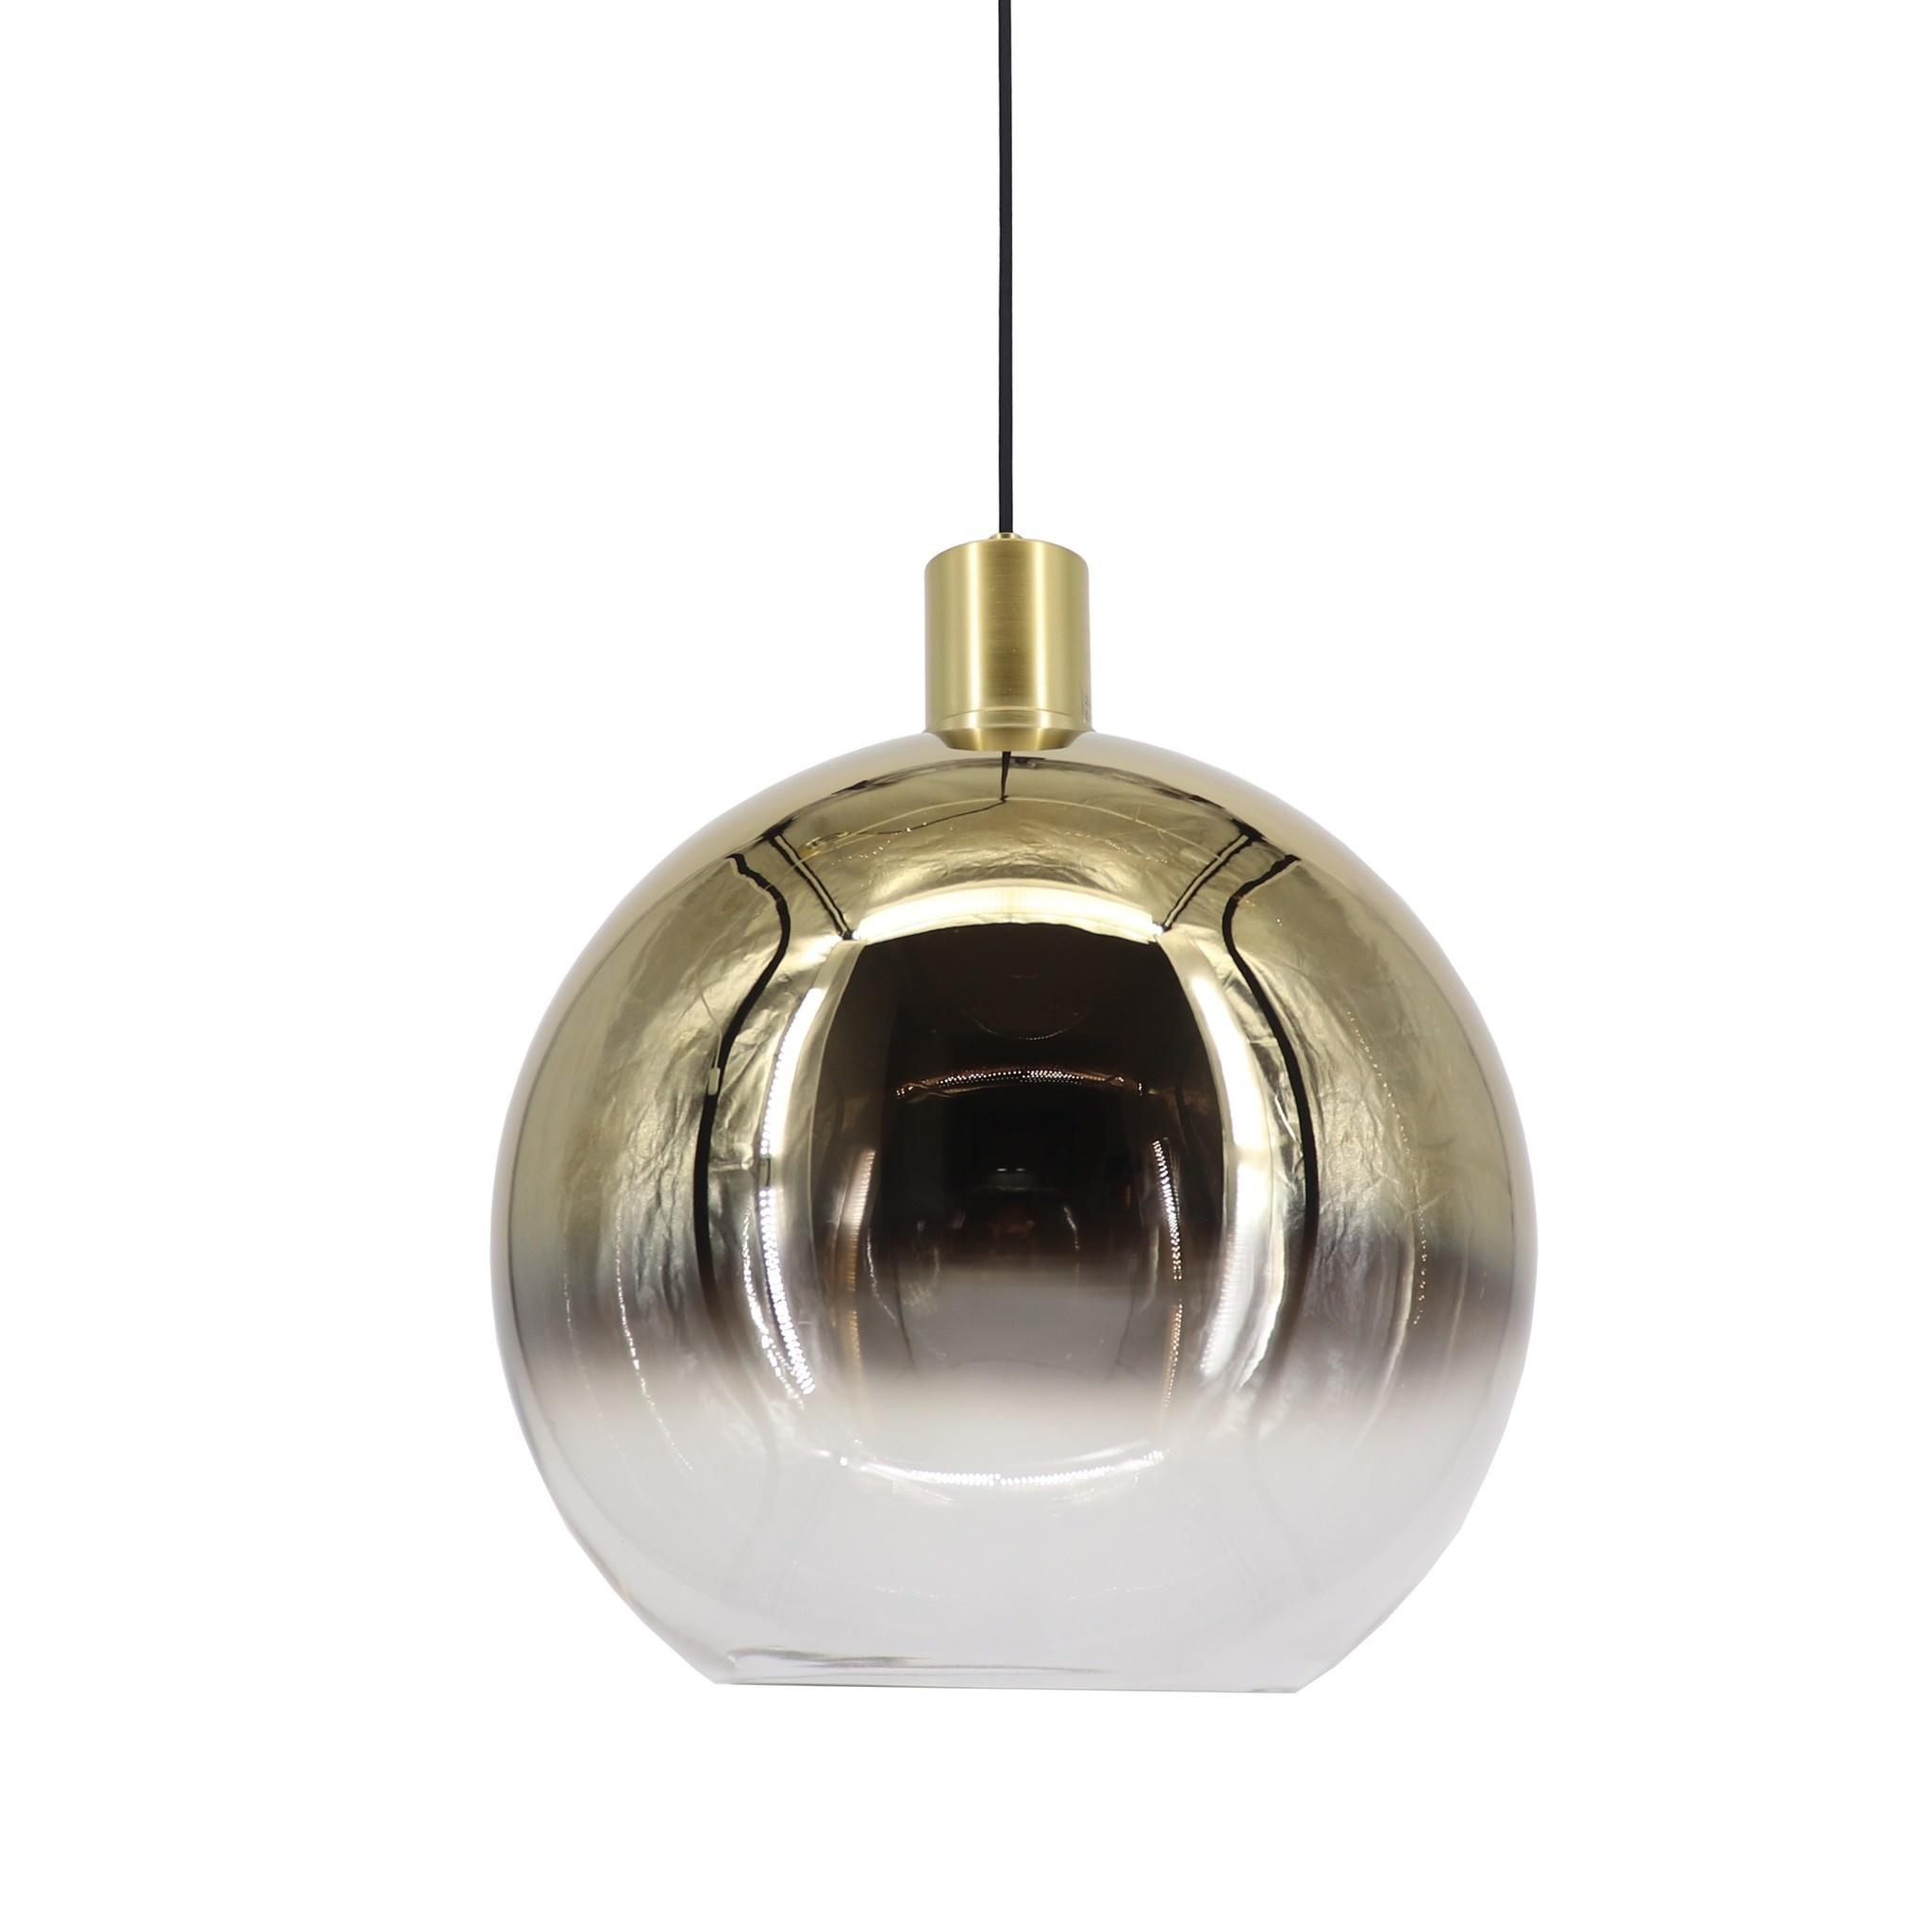 Artdelight Hanglamp Rosario Ø 30 cm glas goud-helder